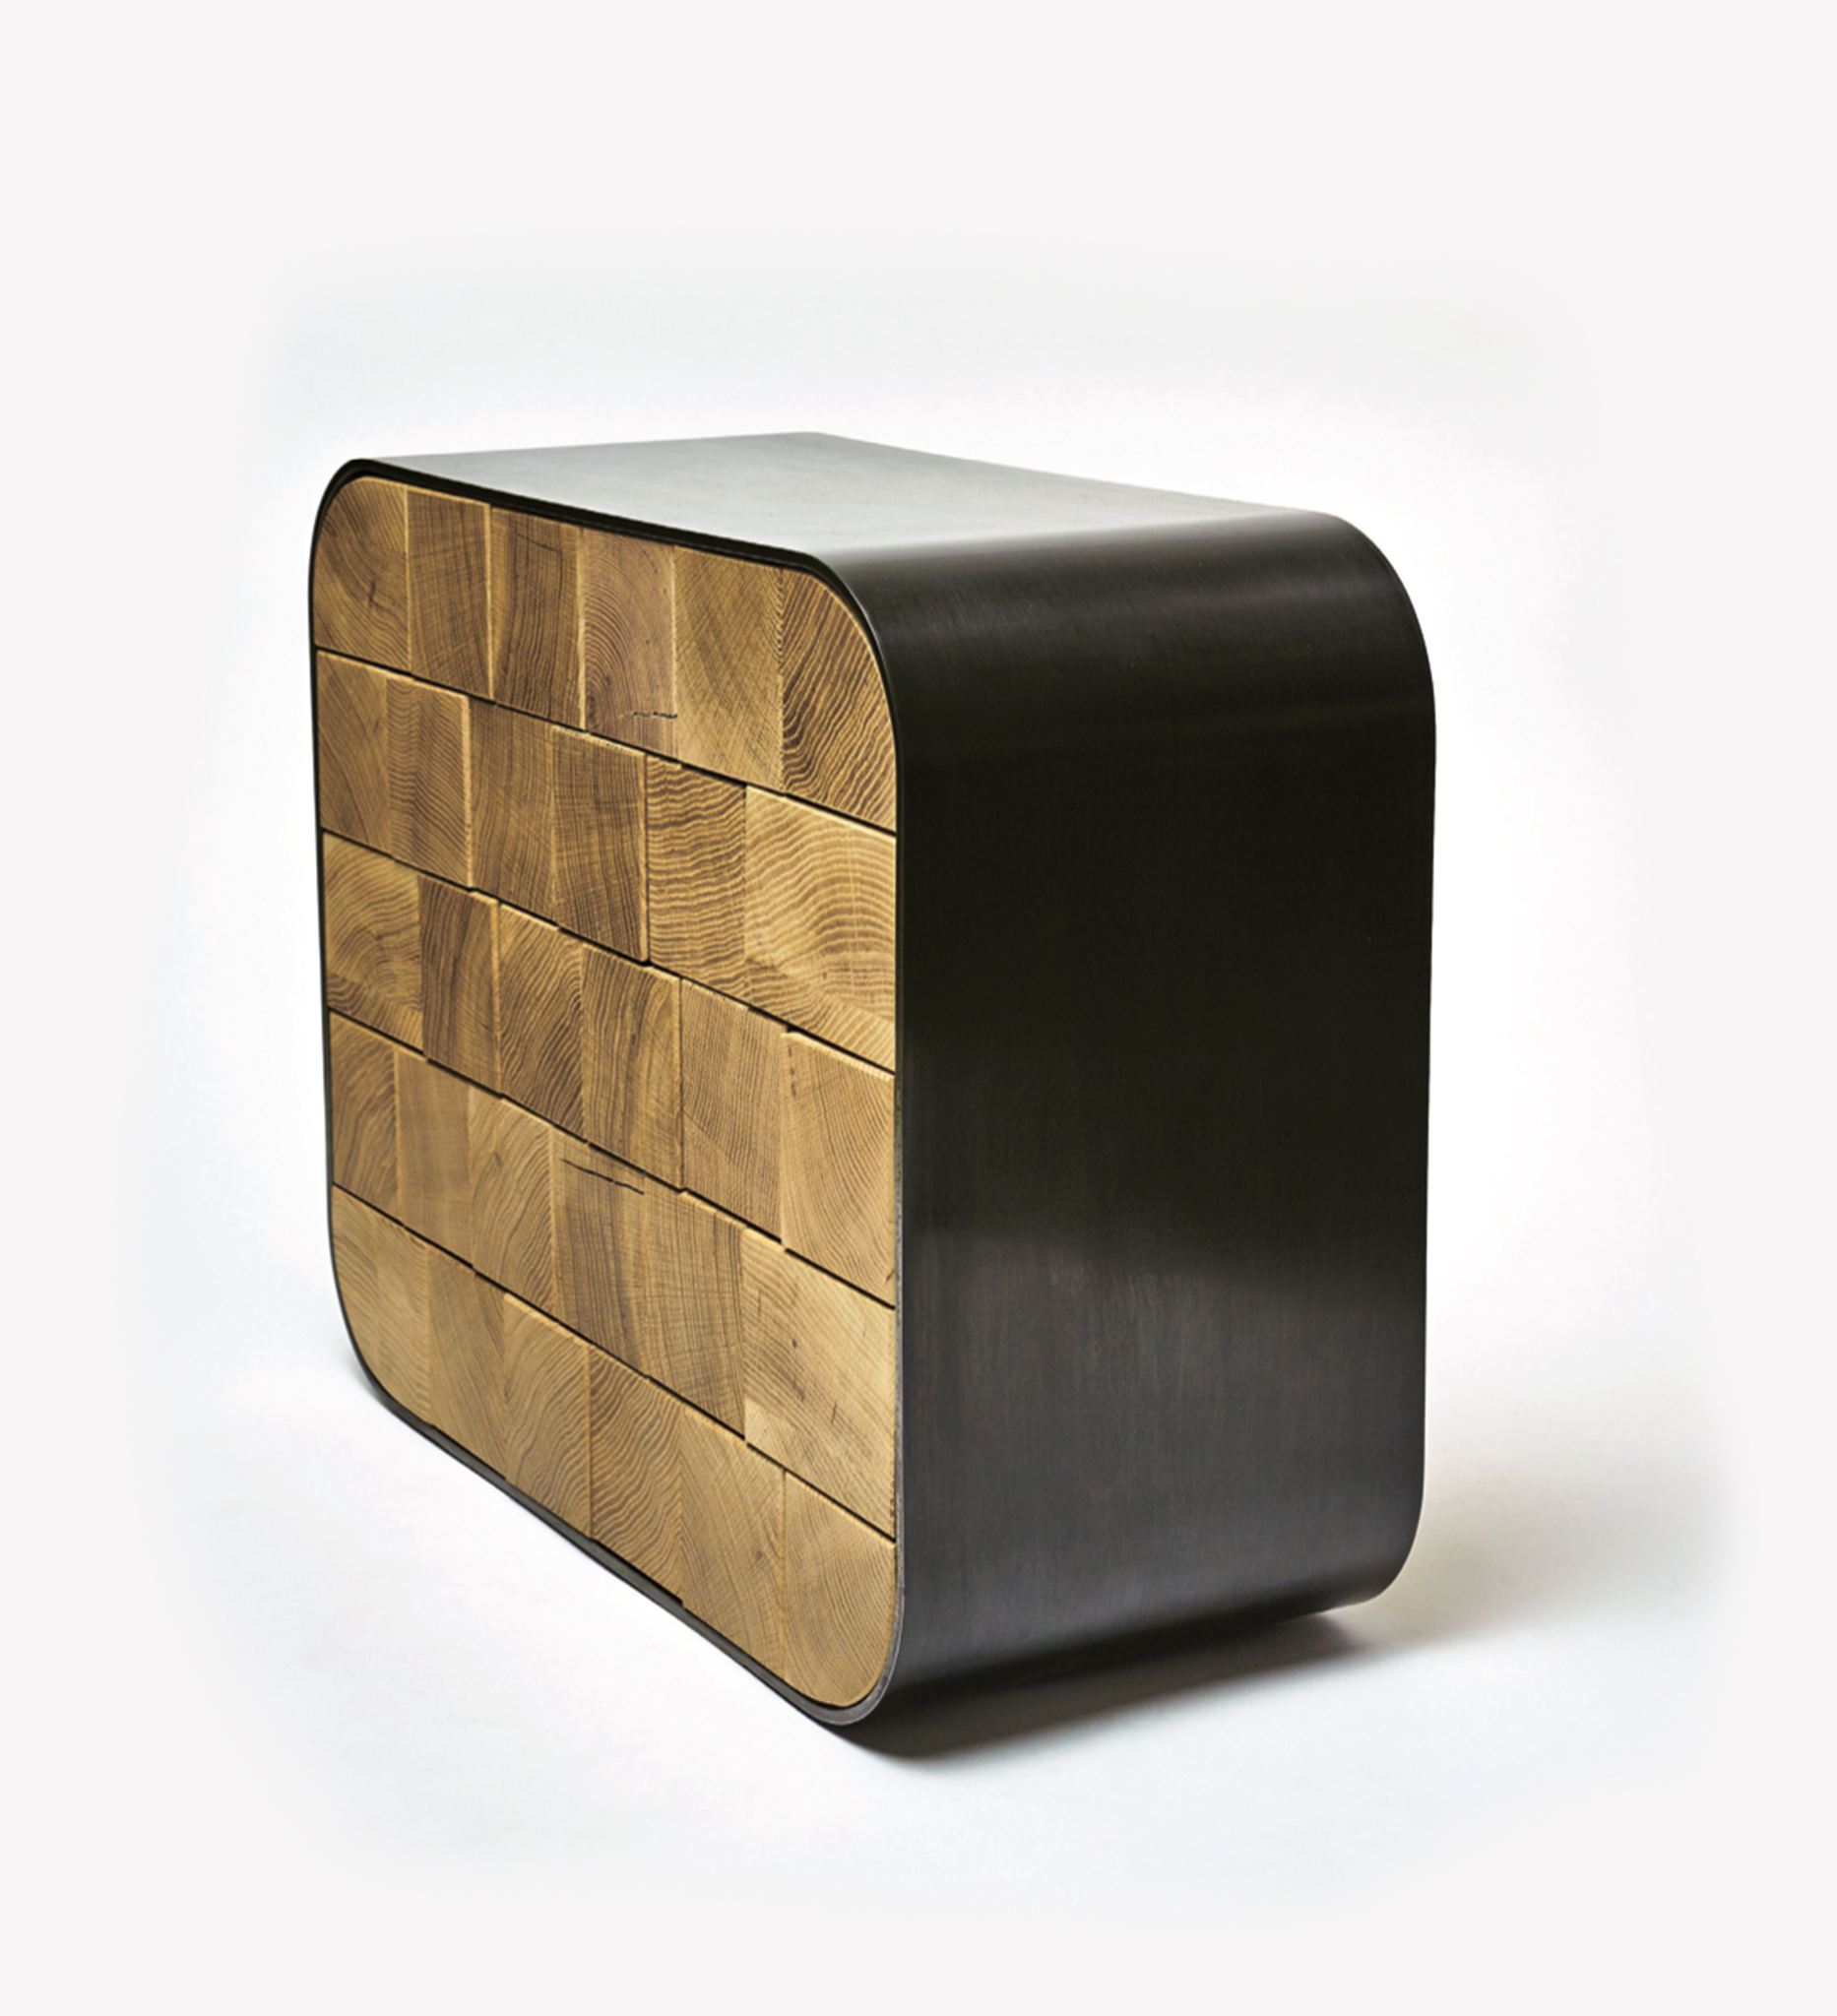 stool, side table